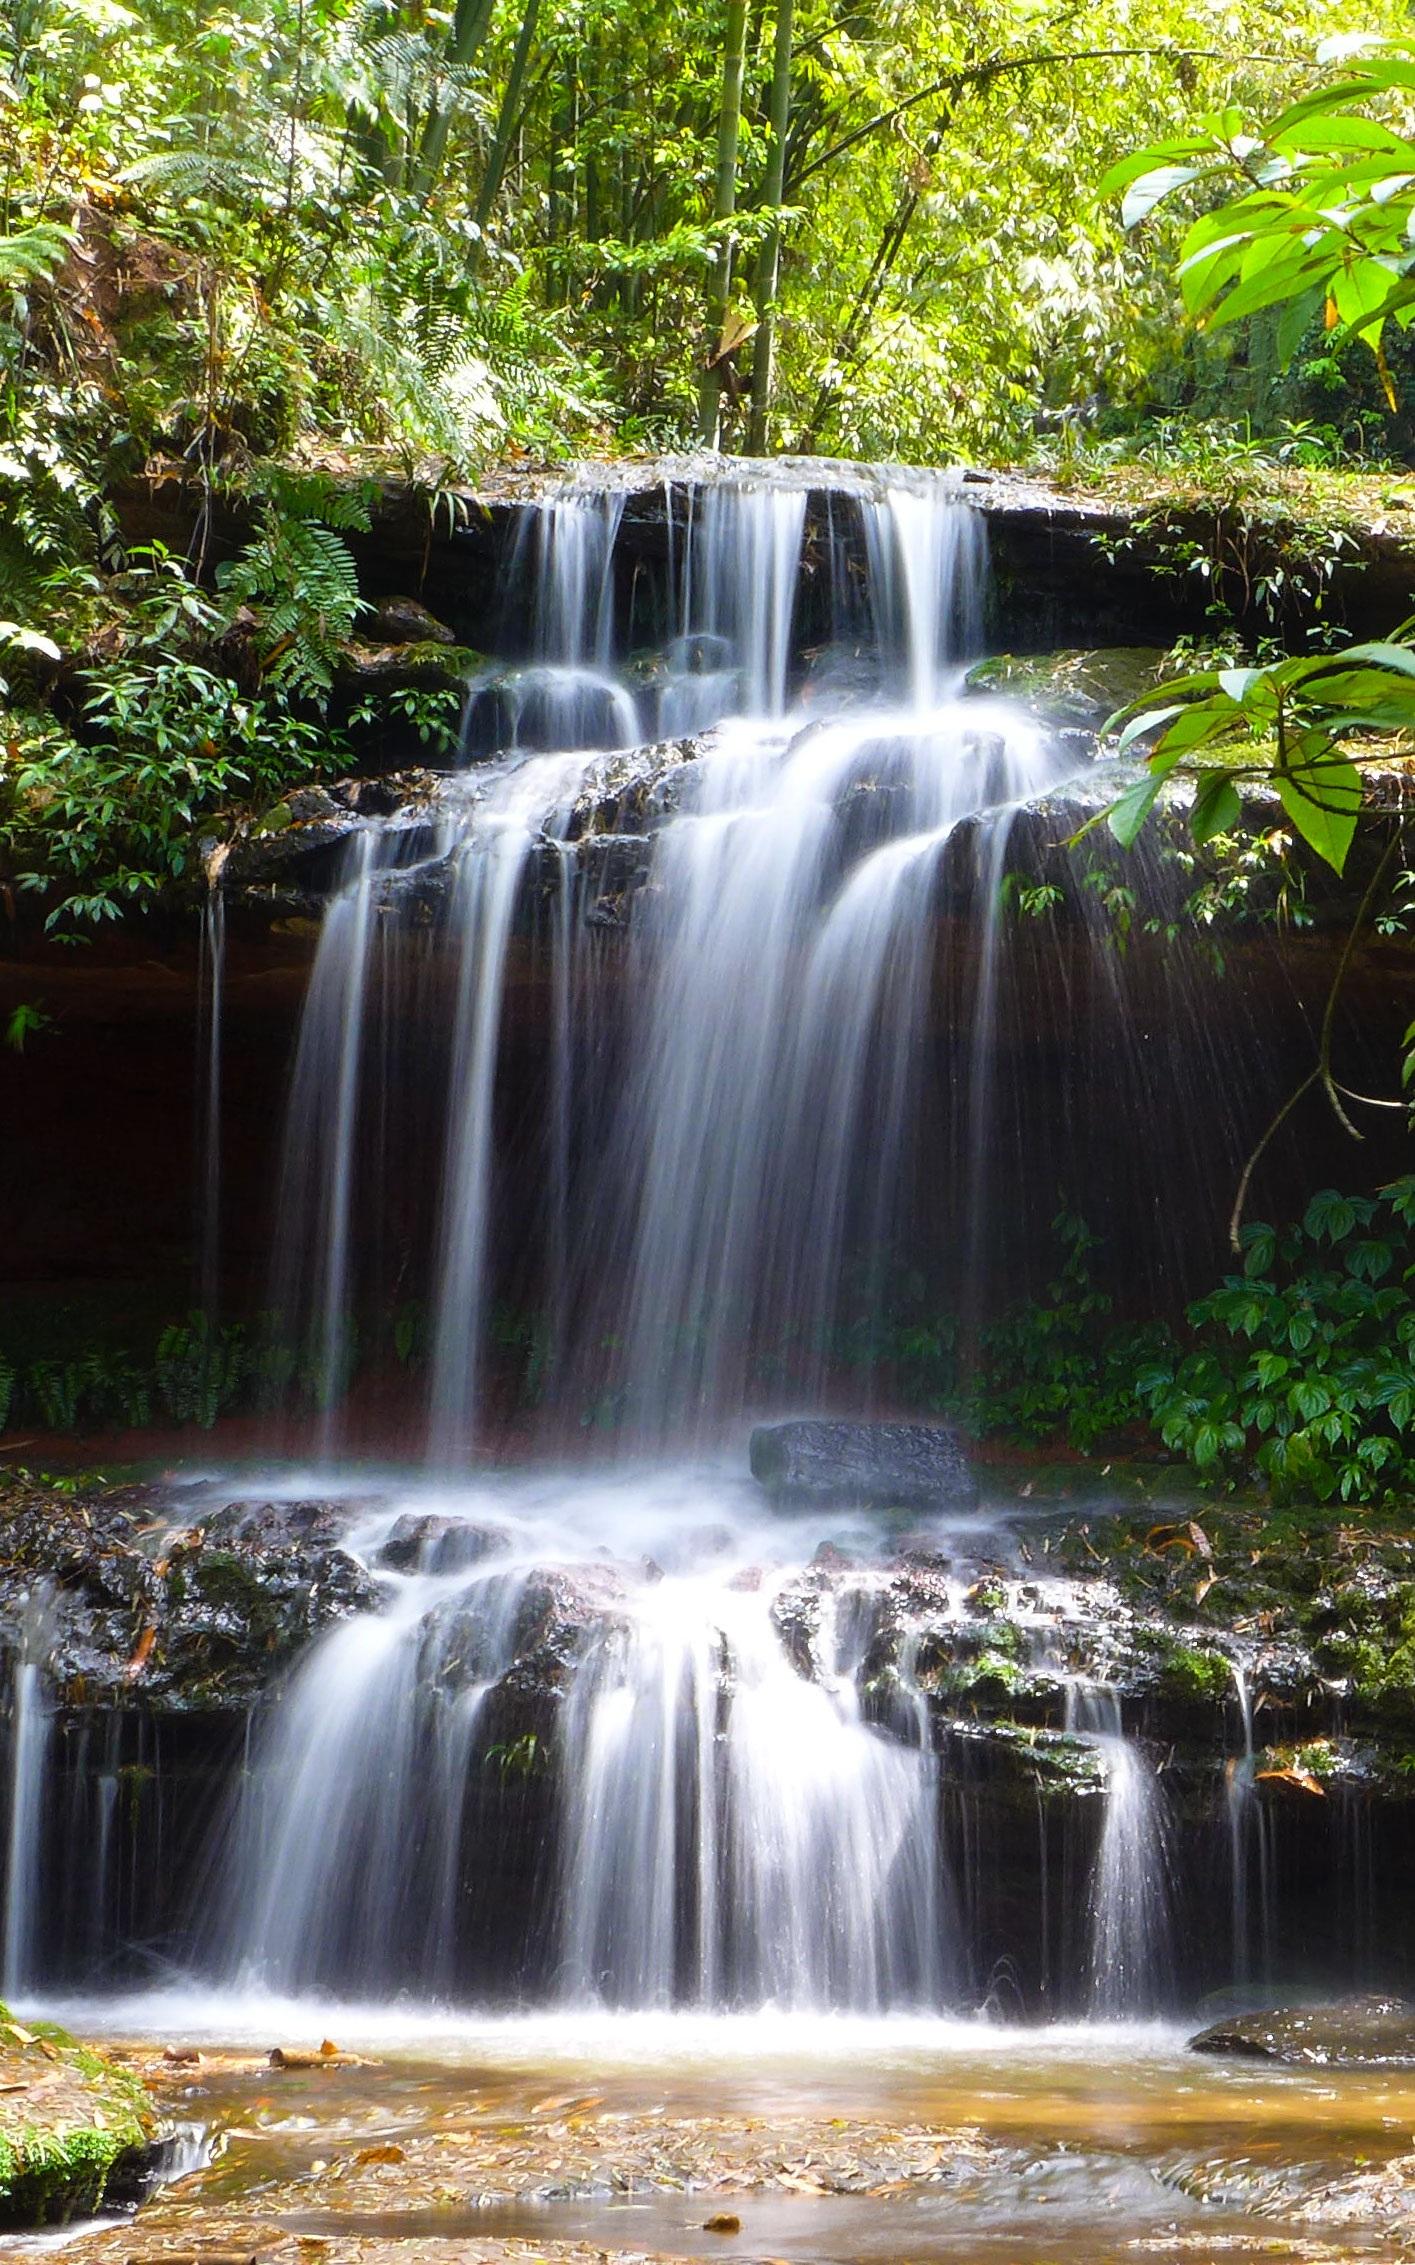 Creek running water falls